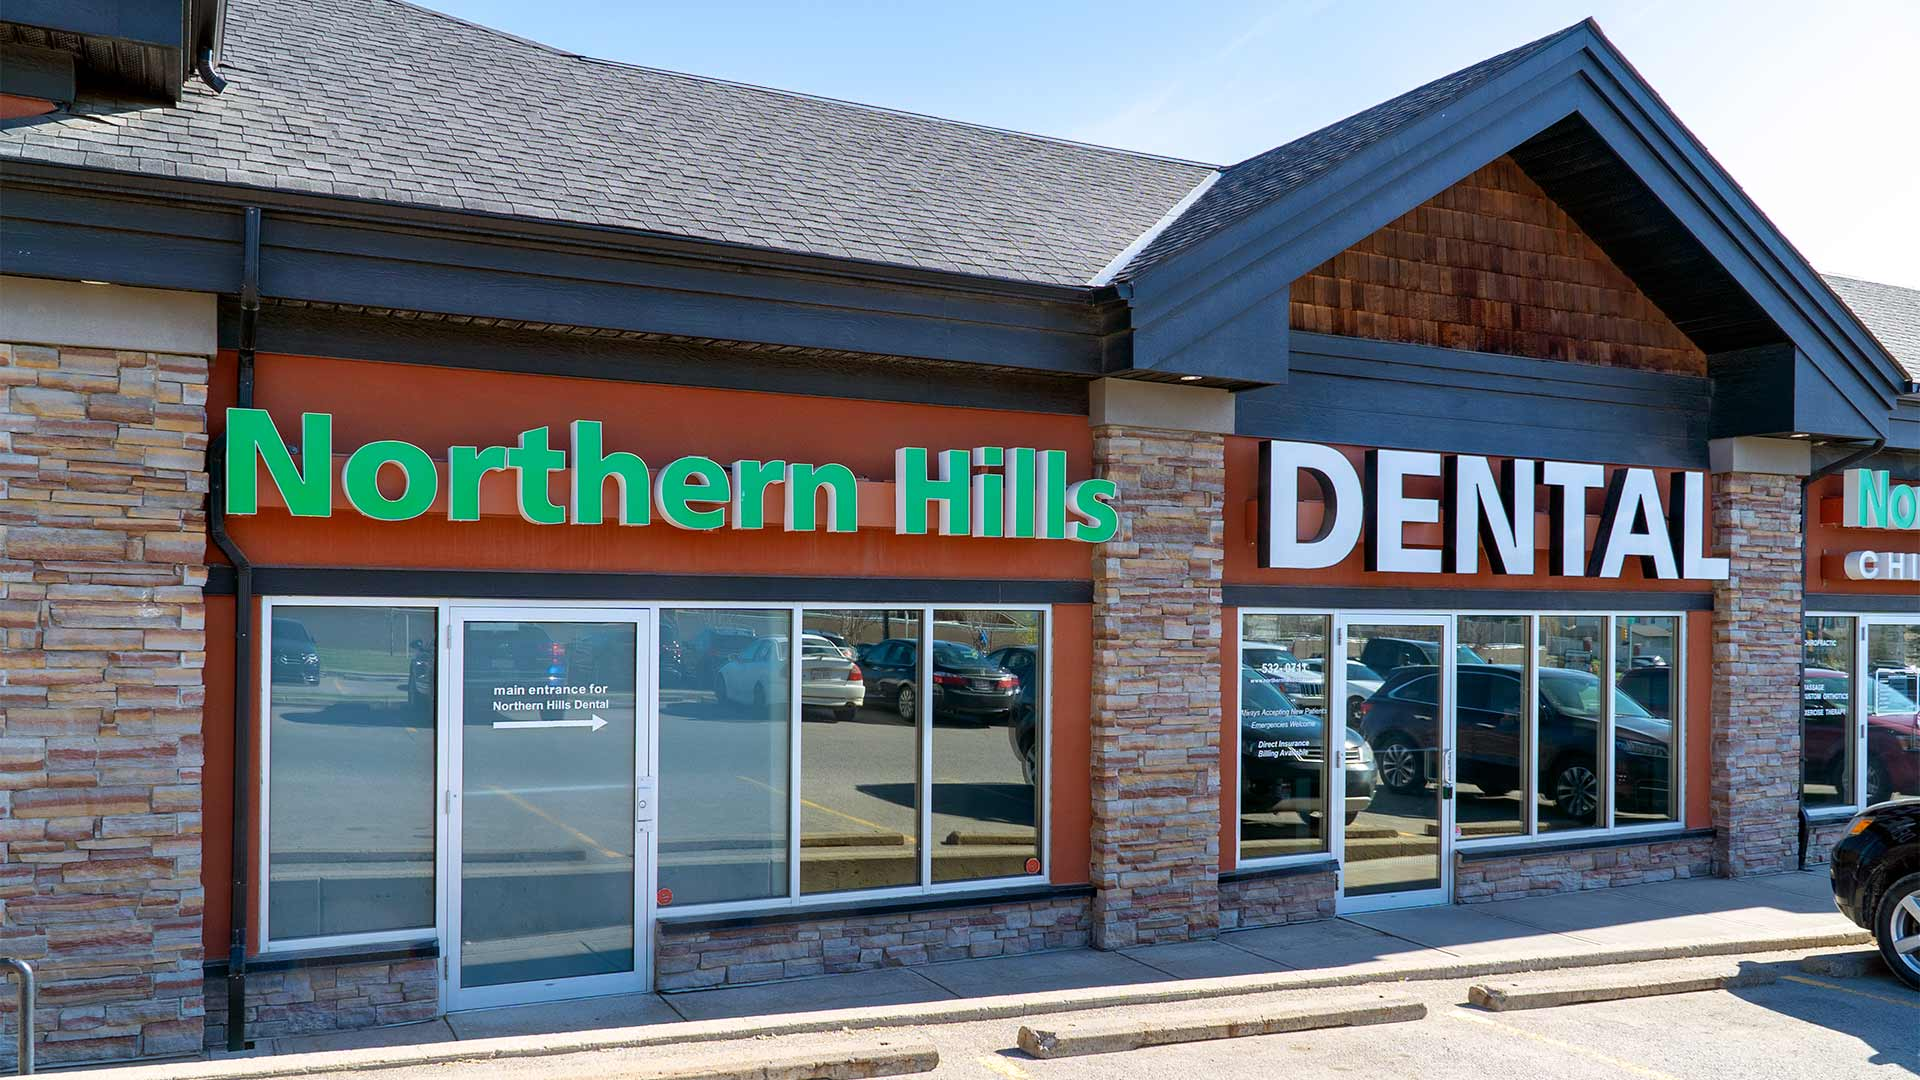 Northern Hills Dental Exterior